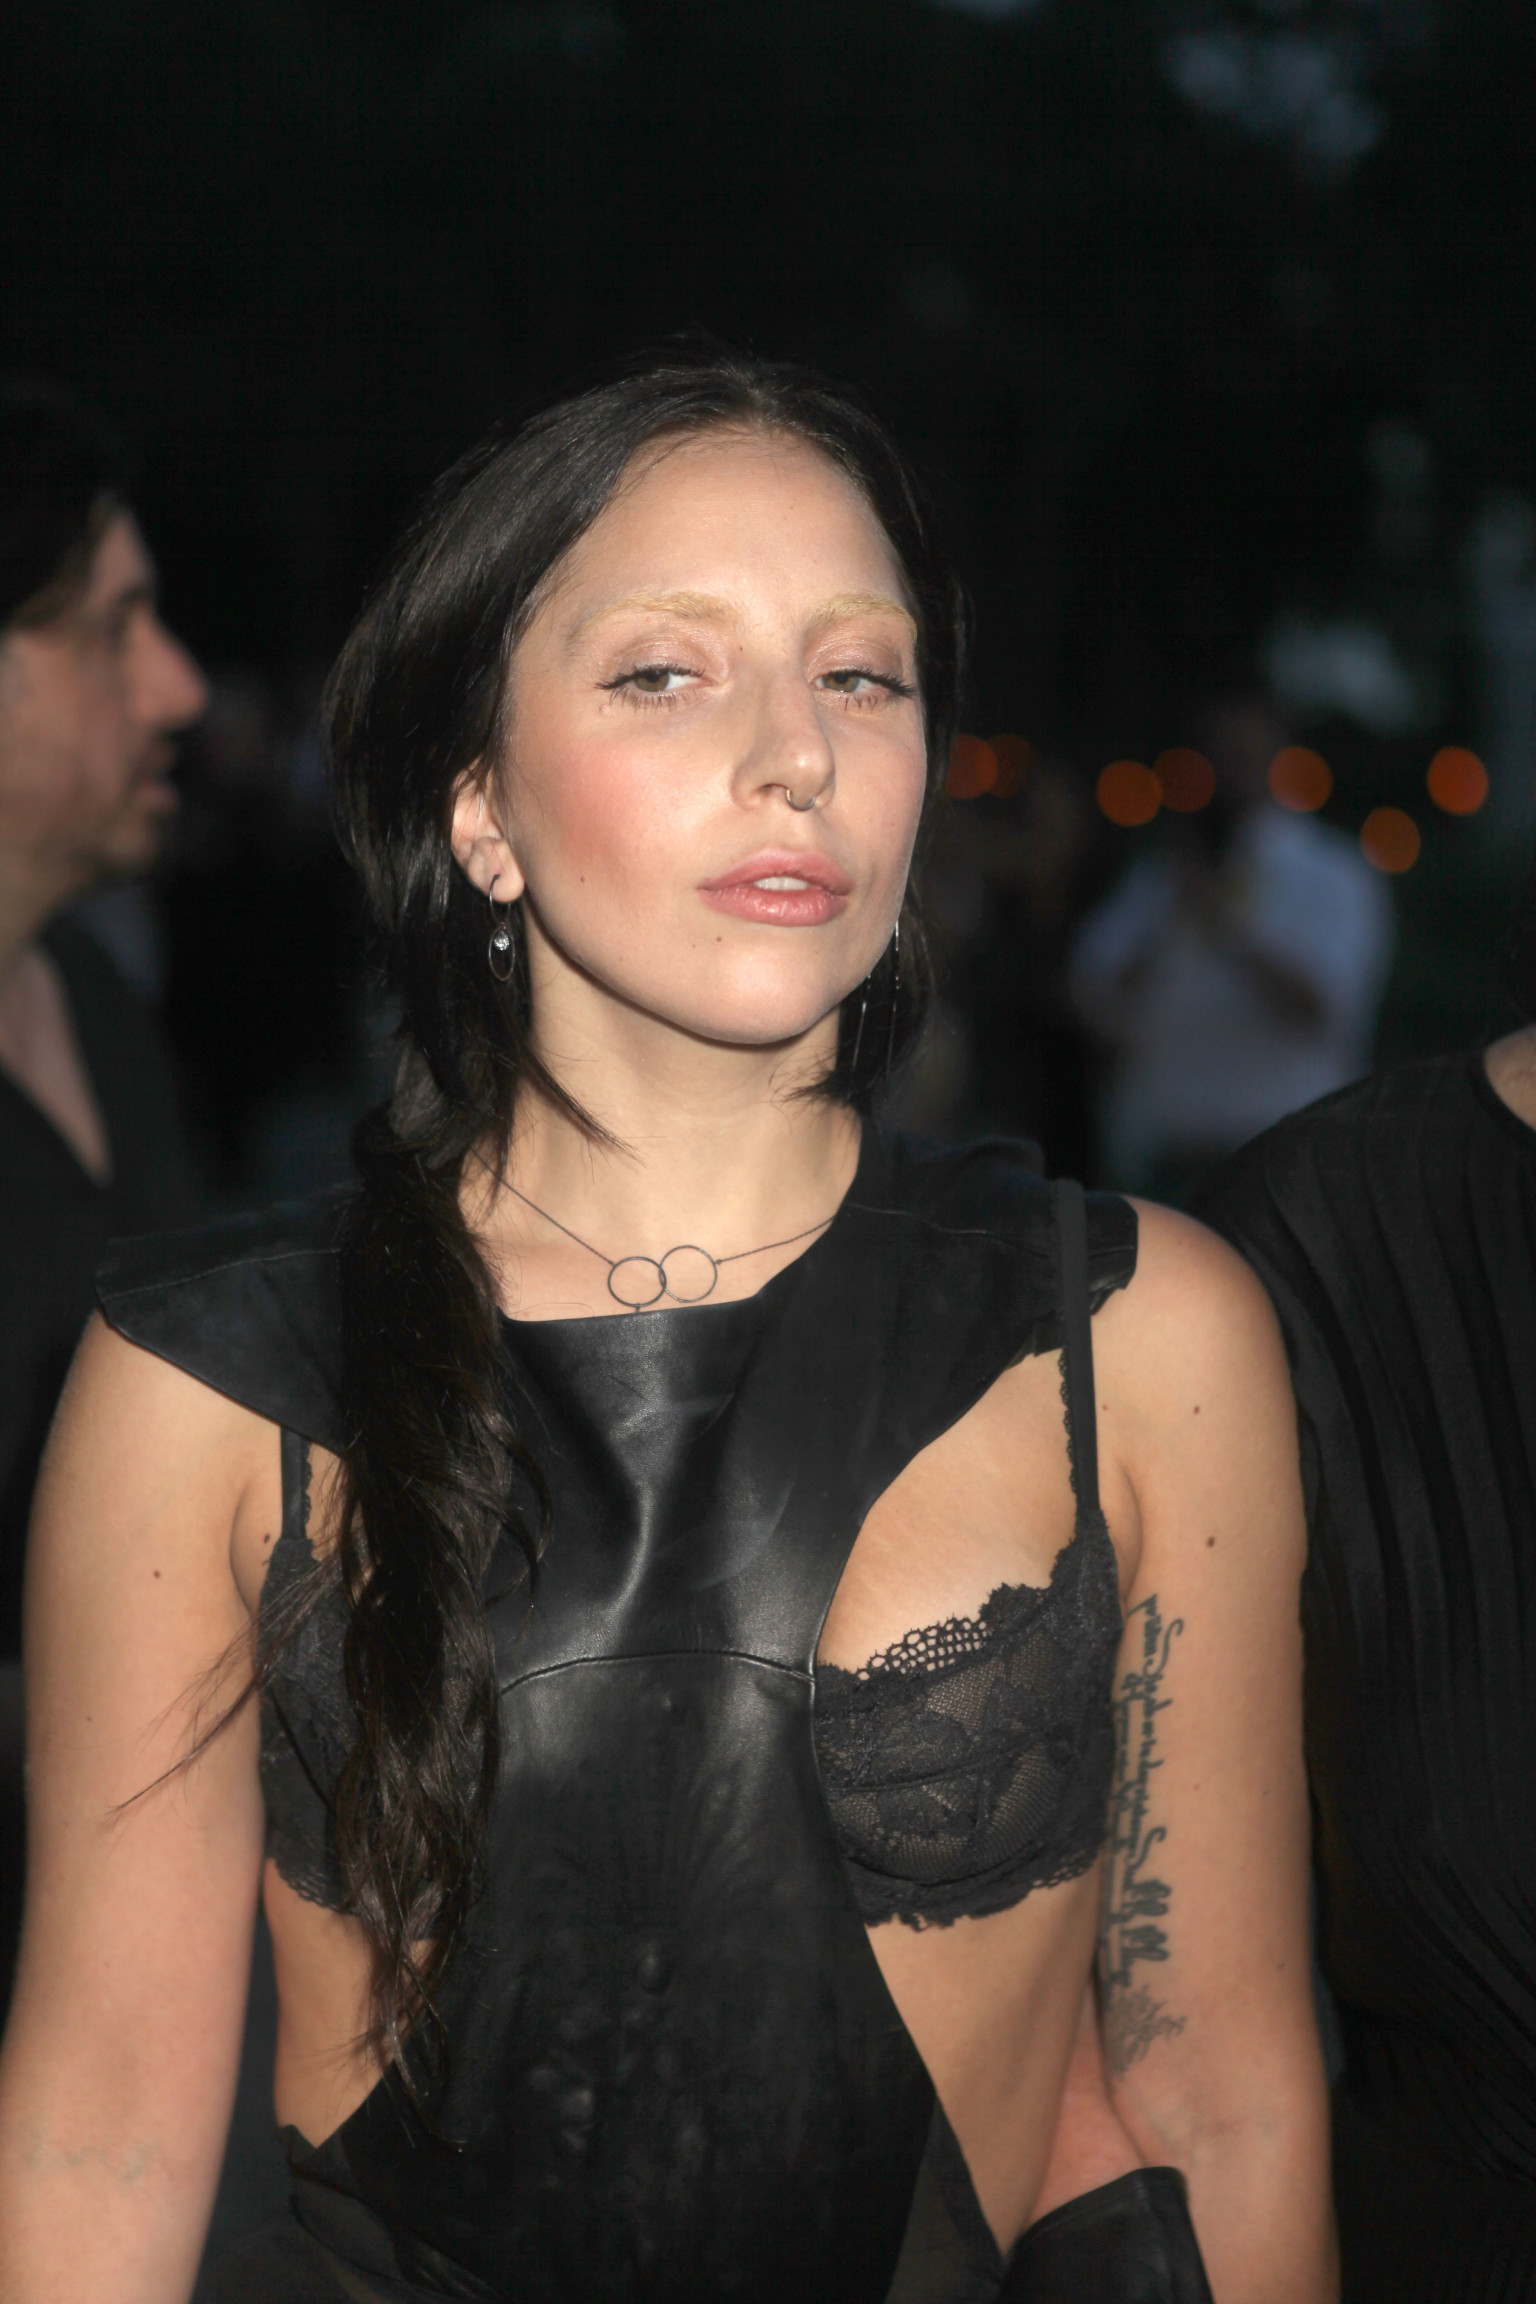 gaga lady brunette nose hair face ring benefit devils heaven outfits weirdest gala mydesignweek eu dark gagas politician york looks